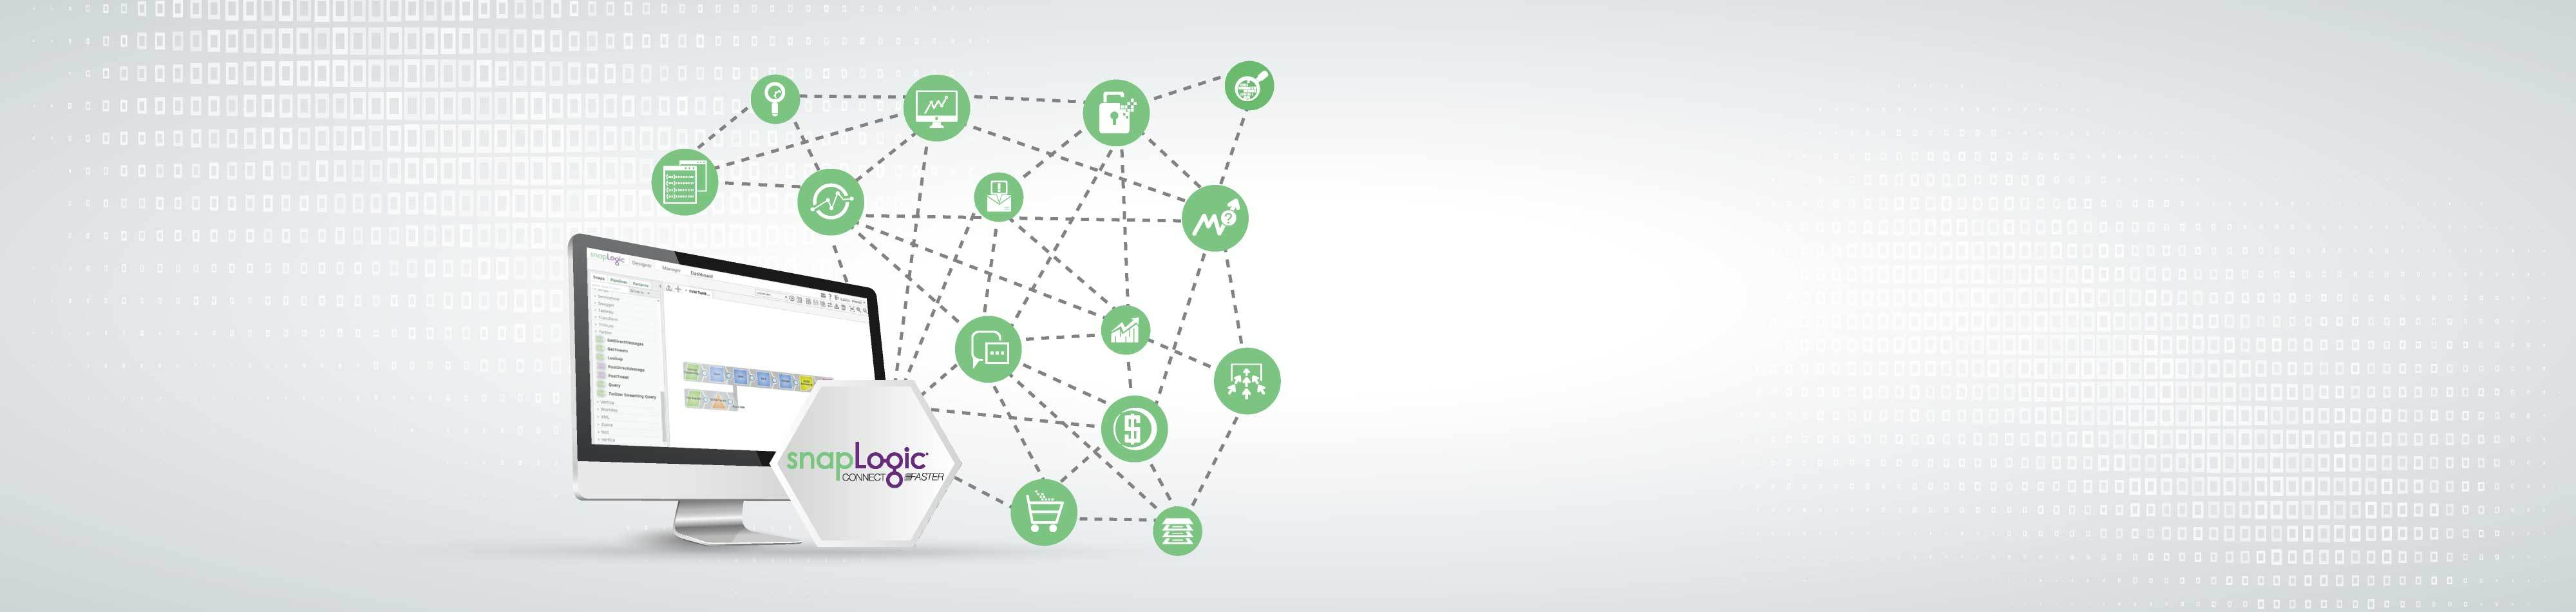 SnapLogic API Management